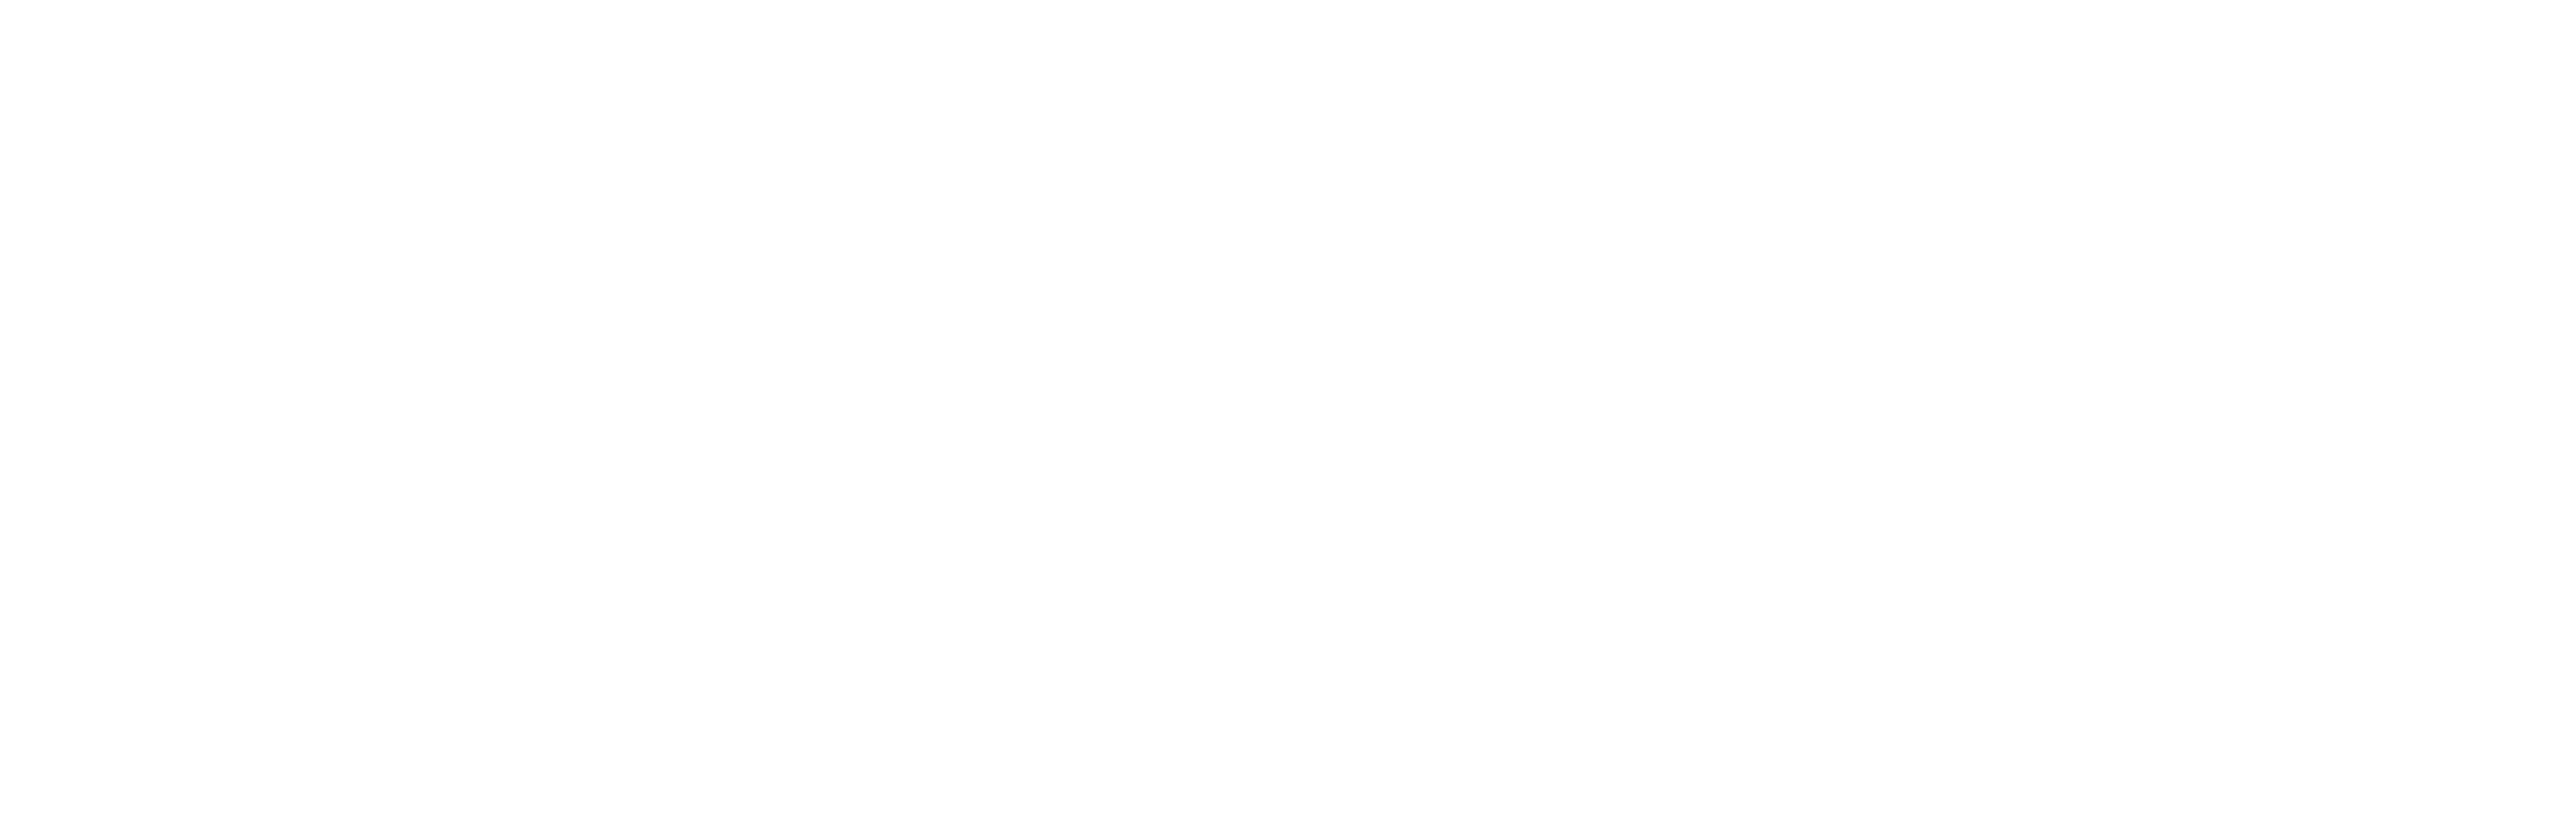 Directorio Nayarit